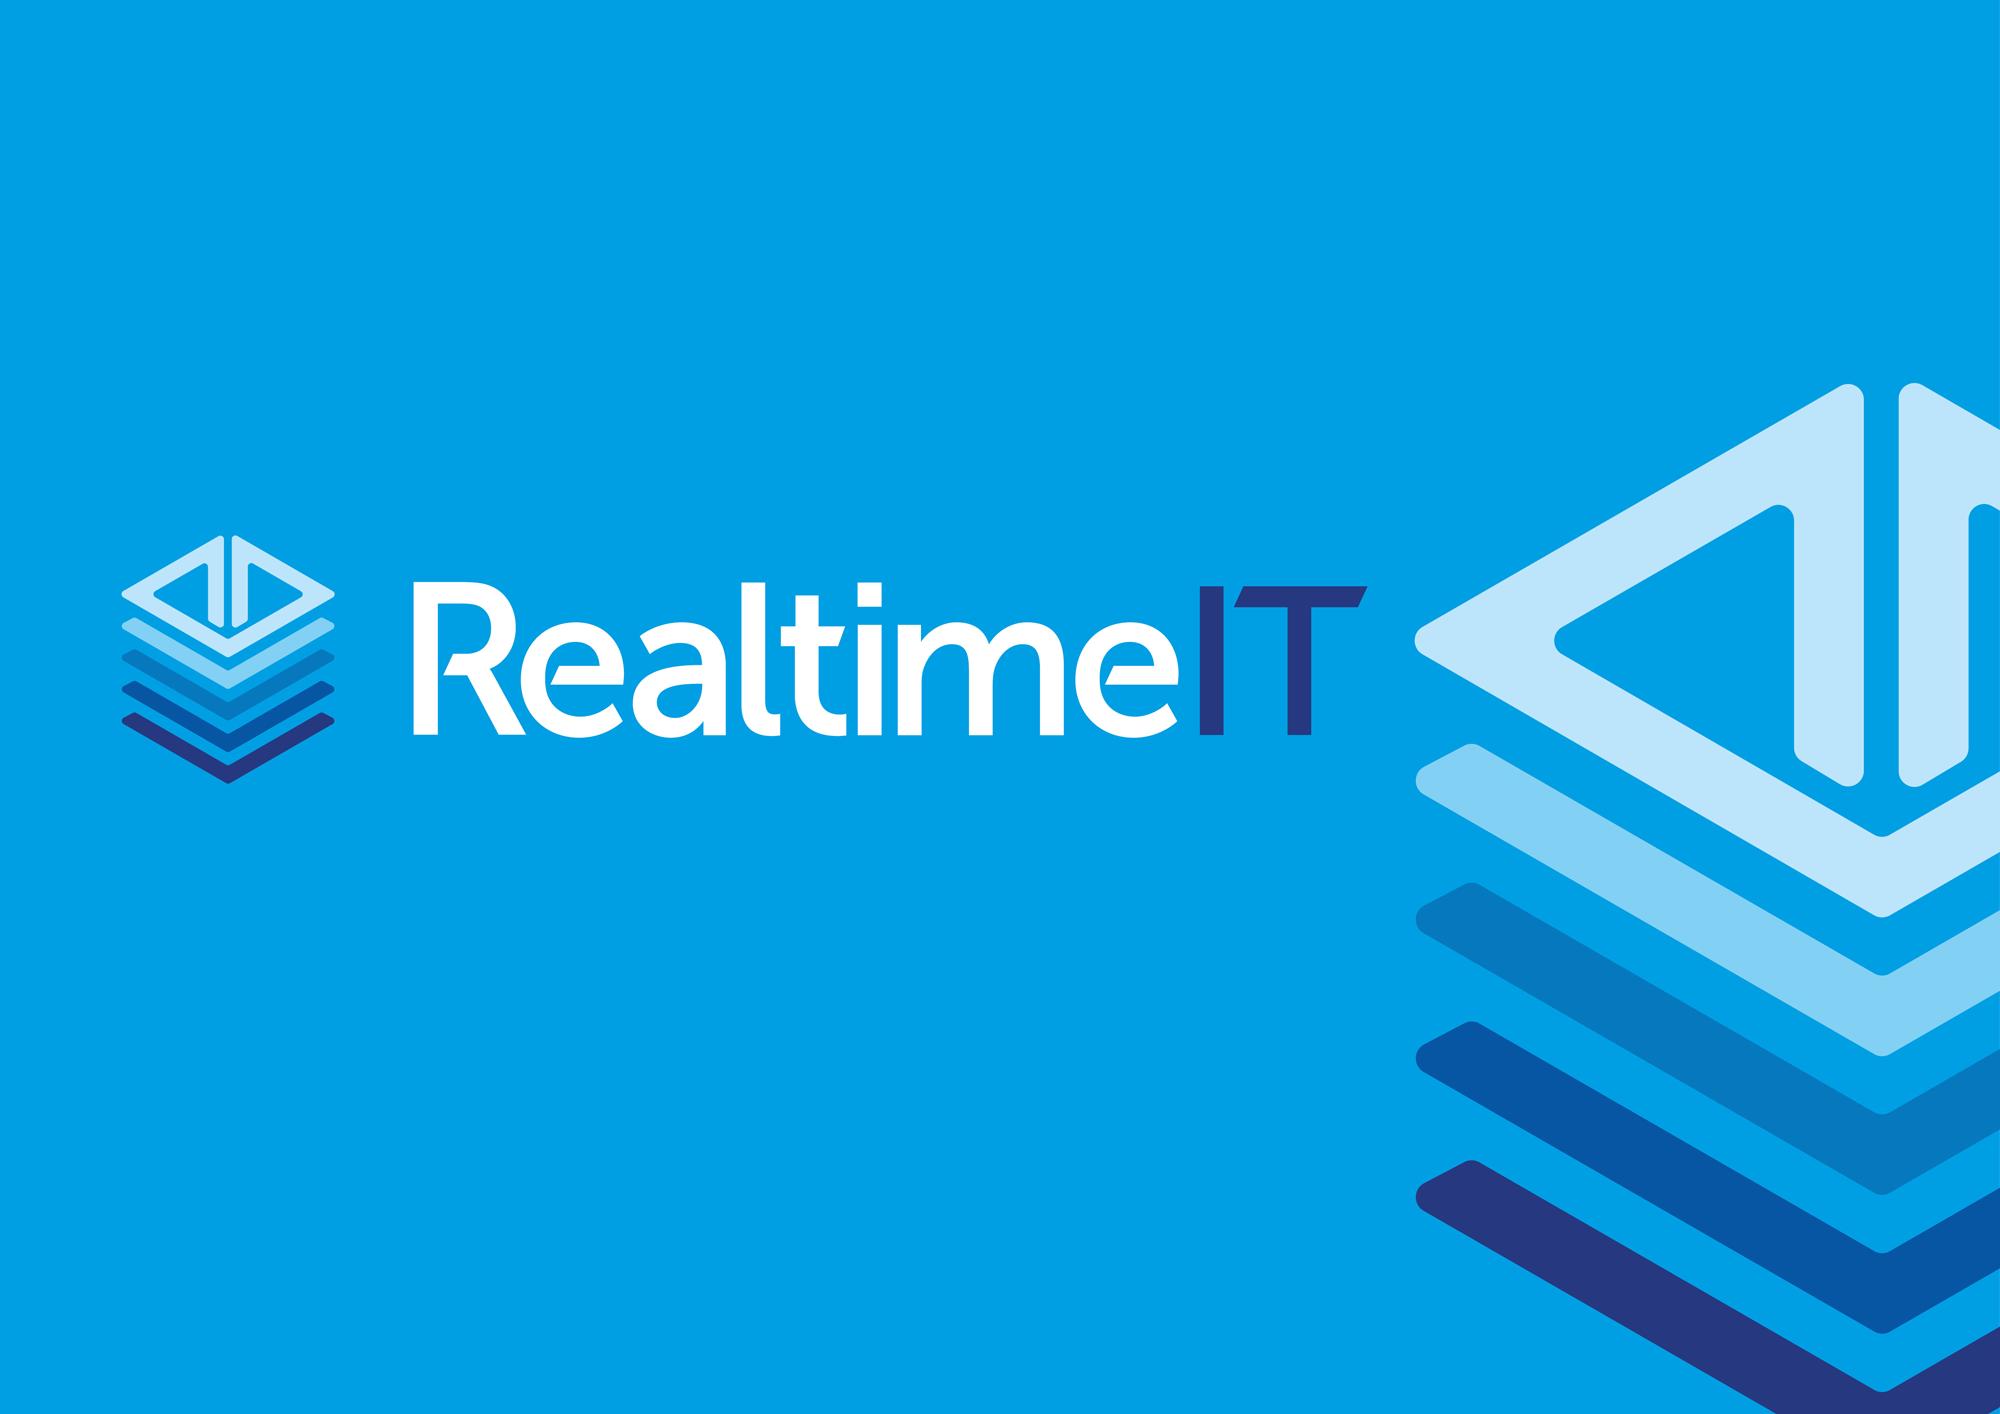 Realtime IT branding